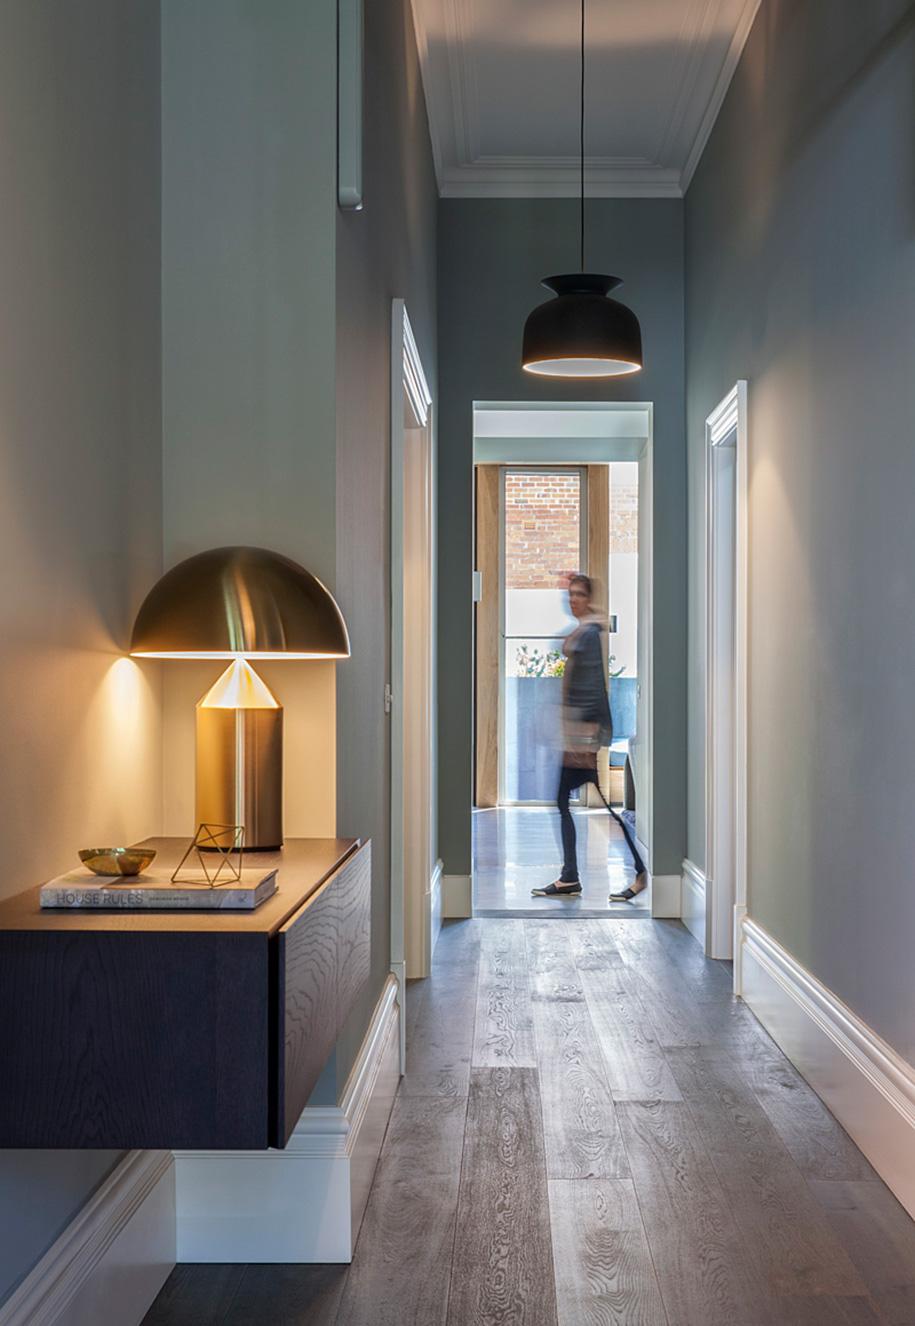 Neil Architecture Wheatland Rd Habitus | Living